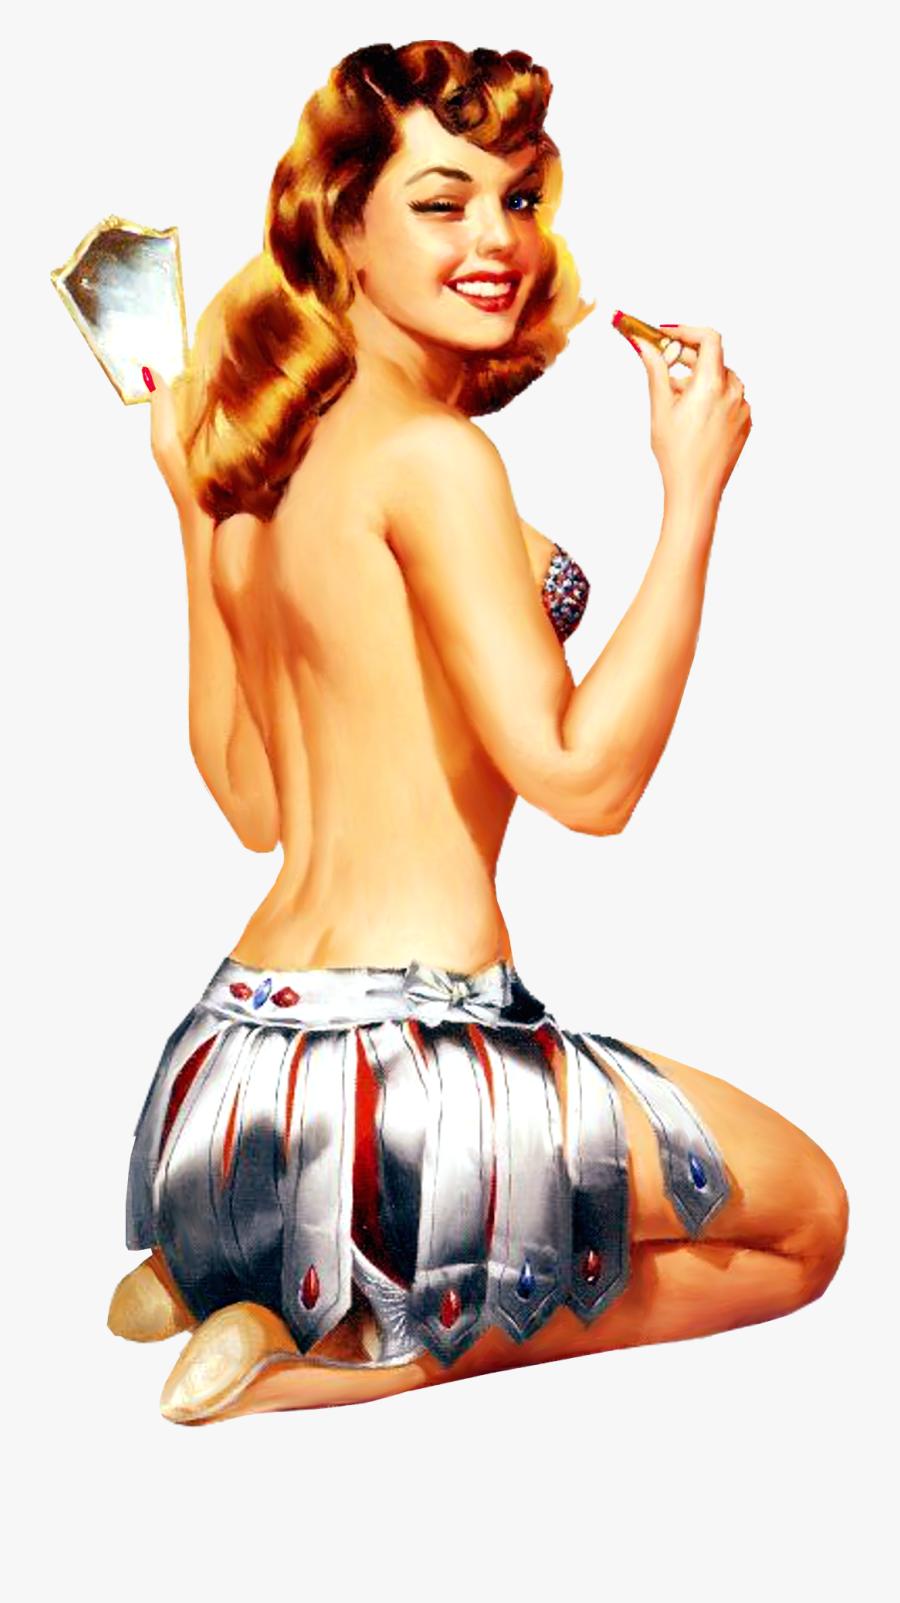 Clip Art Retro Pin Up Girl - Retro Pin Up Png, Transparent Clipart